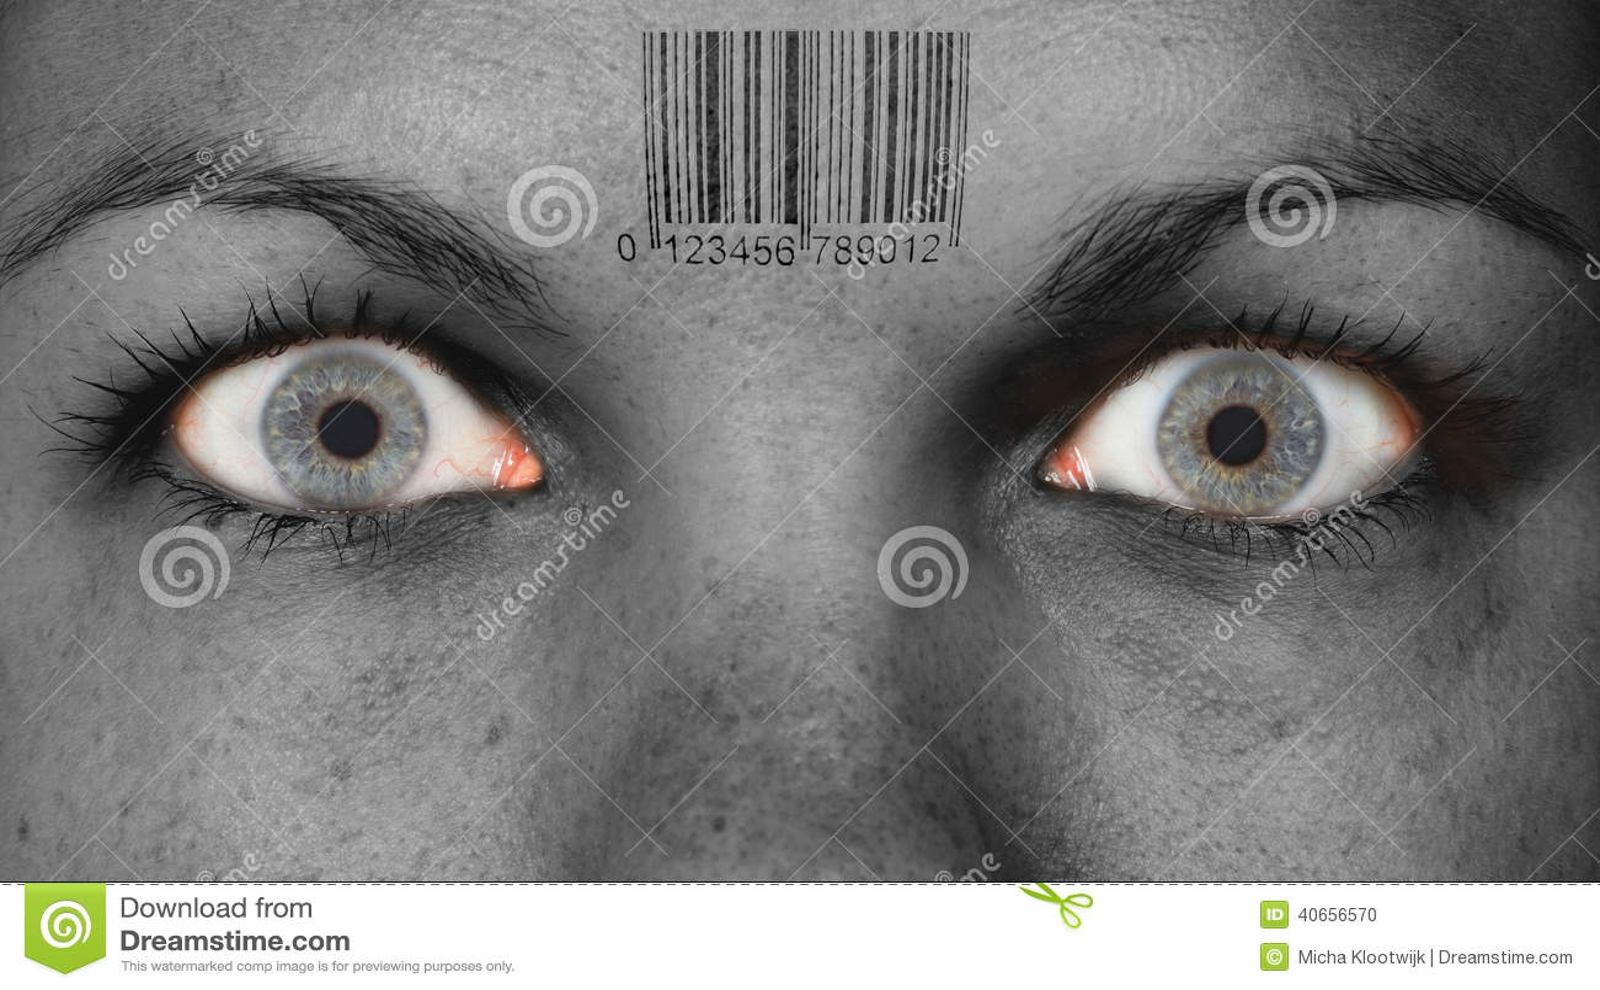 Women eye, close-up